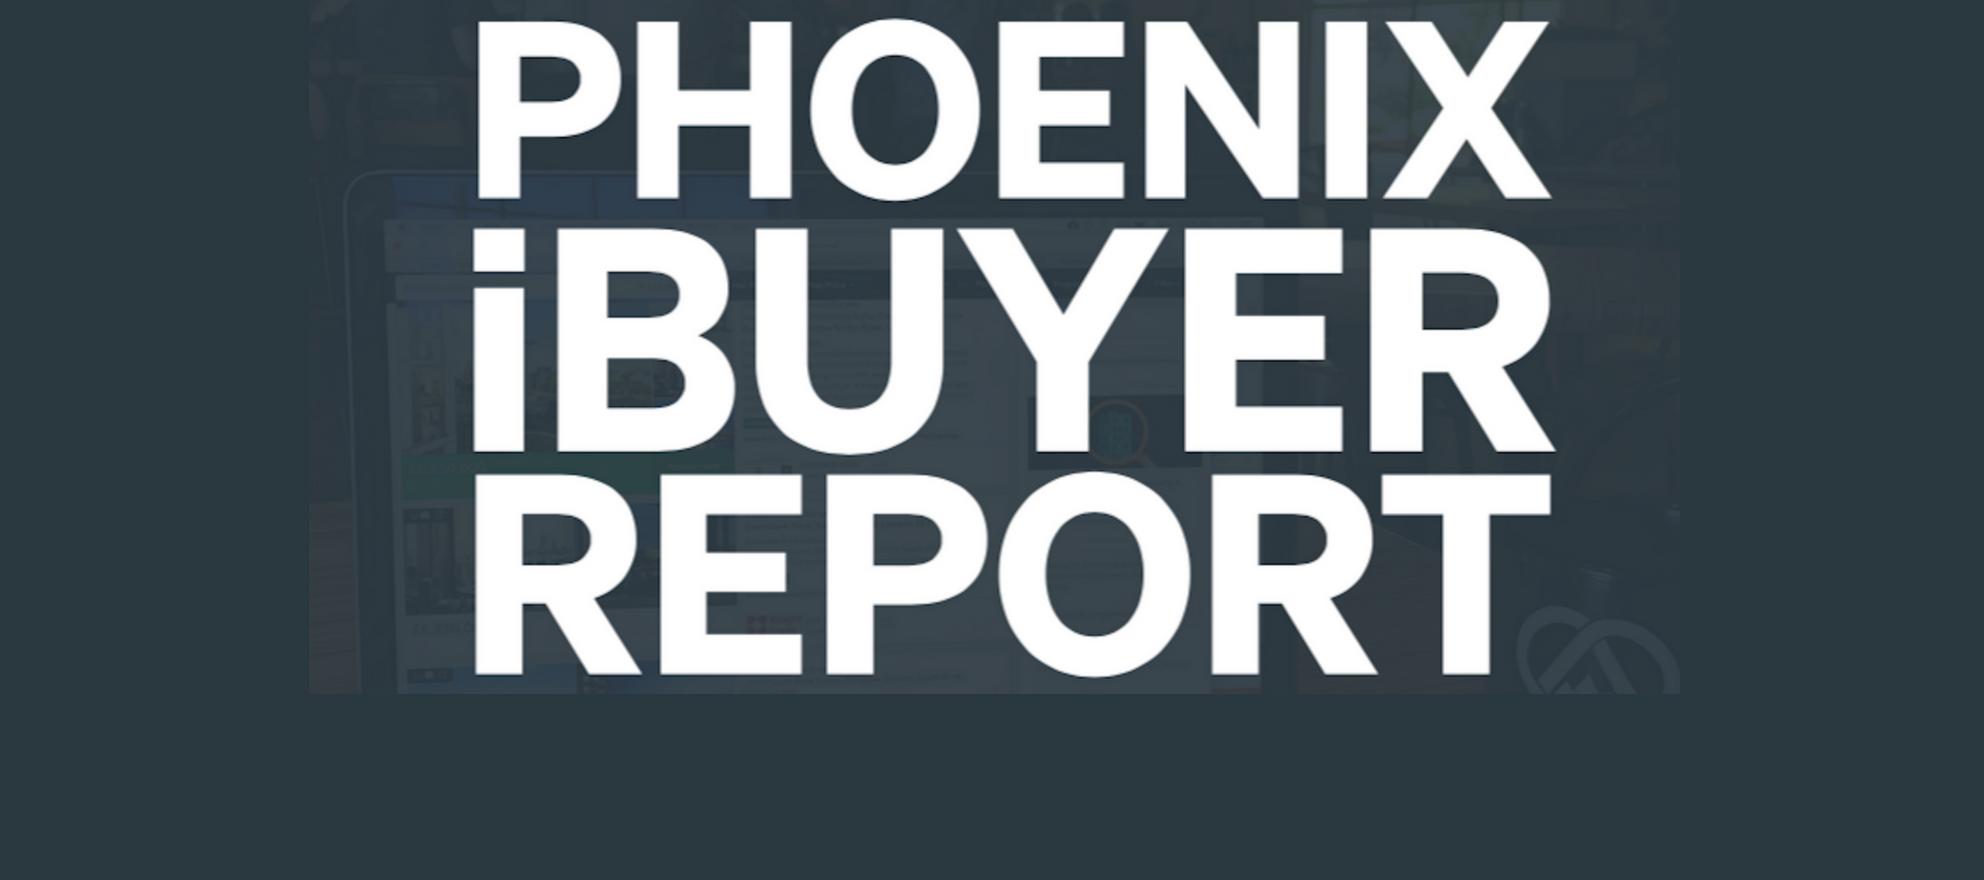 phoeniz ibuyer report